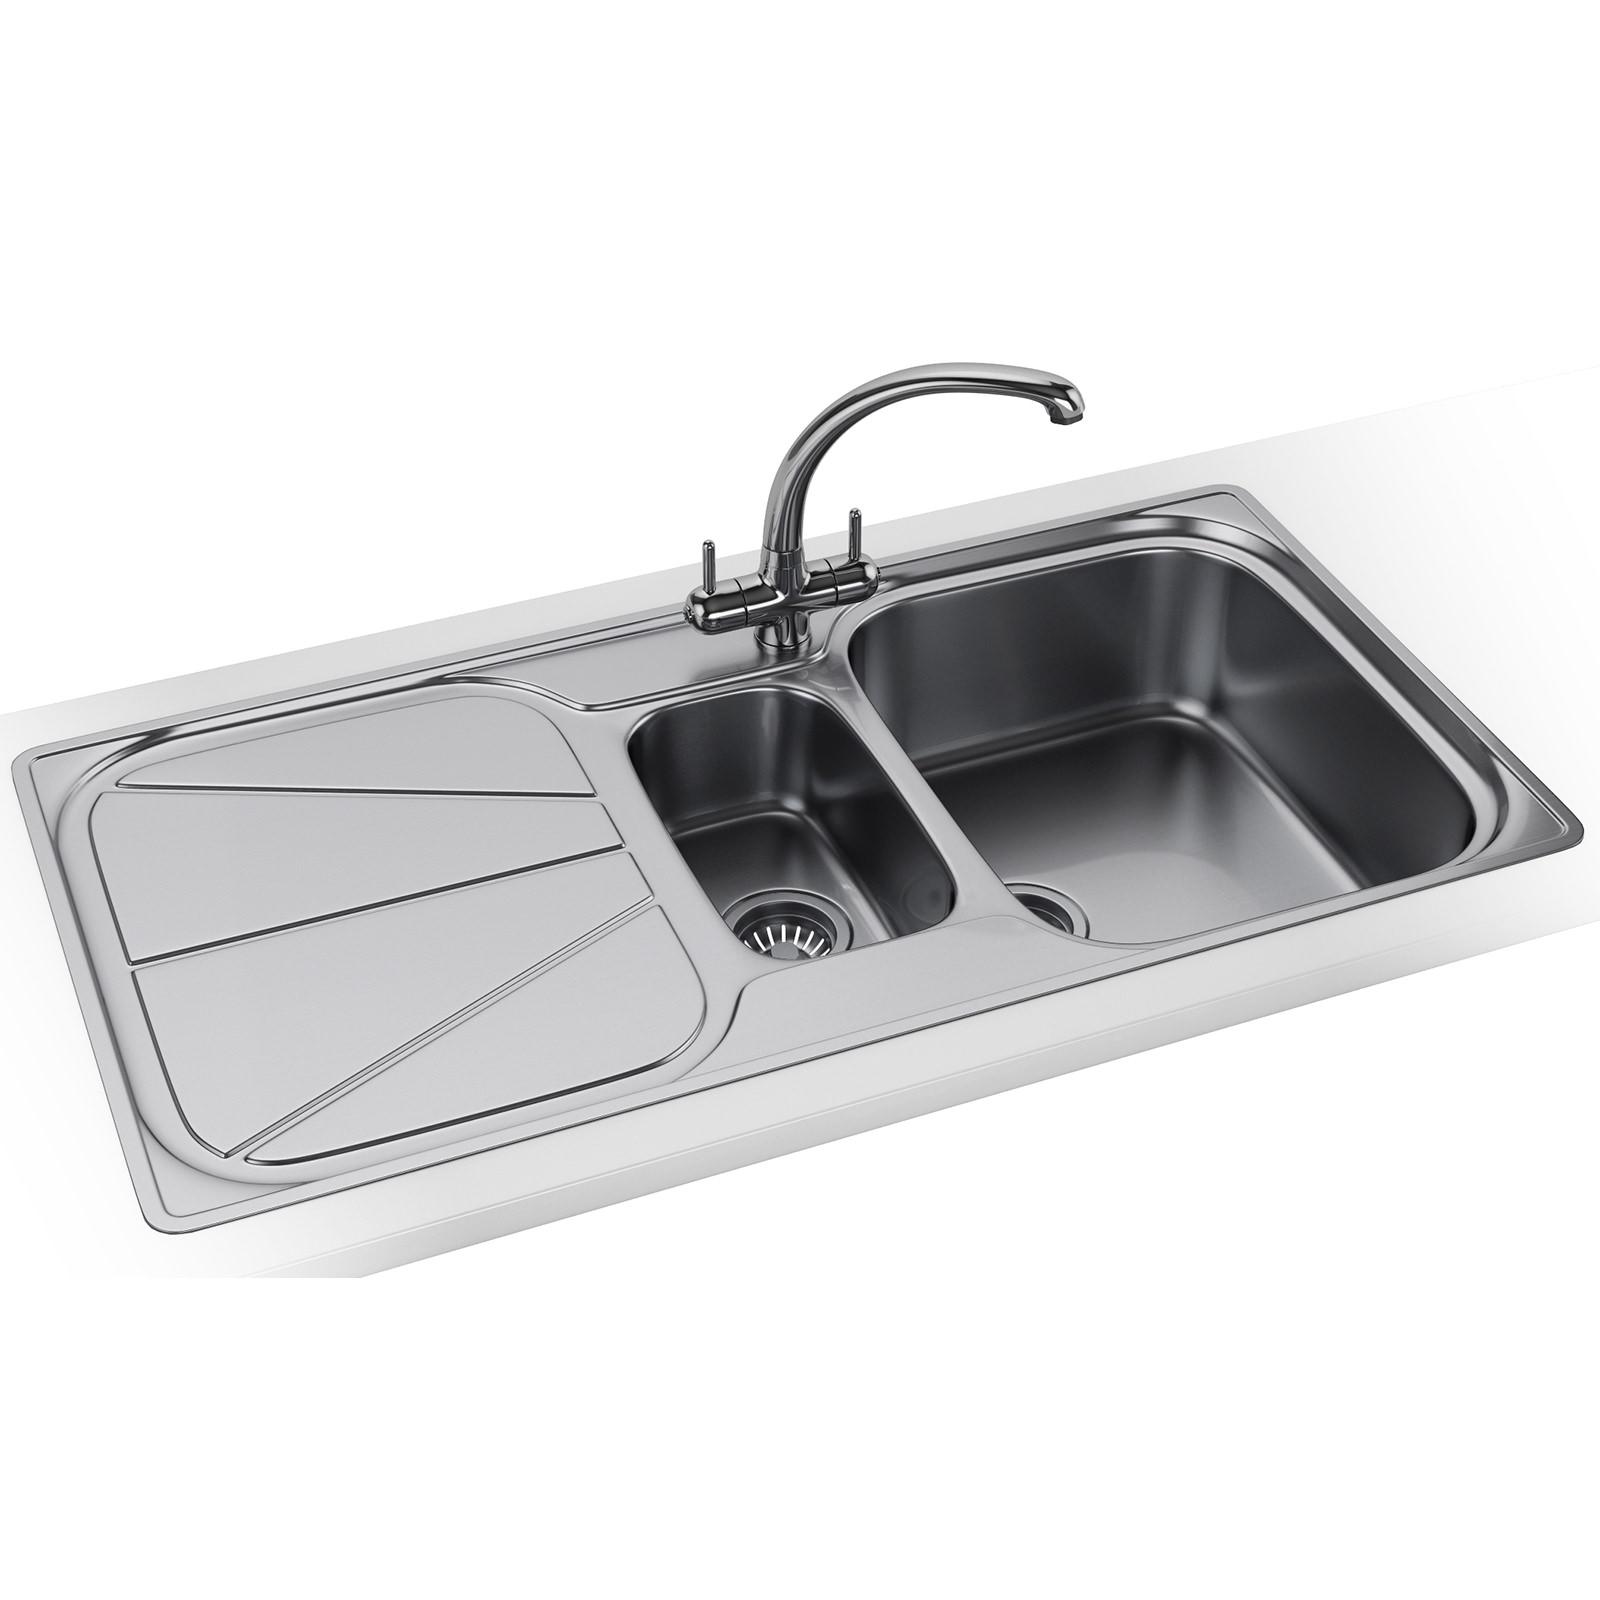 Franke Simplon Spx 651 Stainless Steel 1 5 Bowl Kitchen Inset Sink